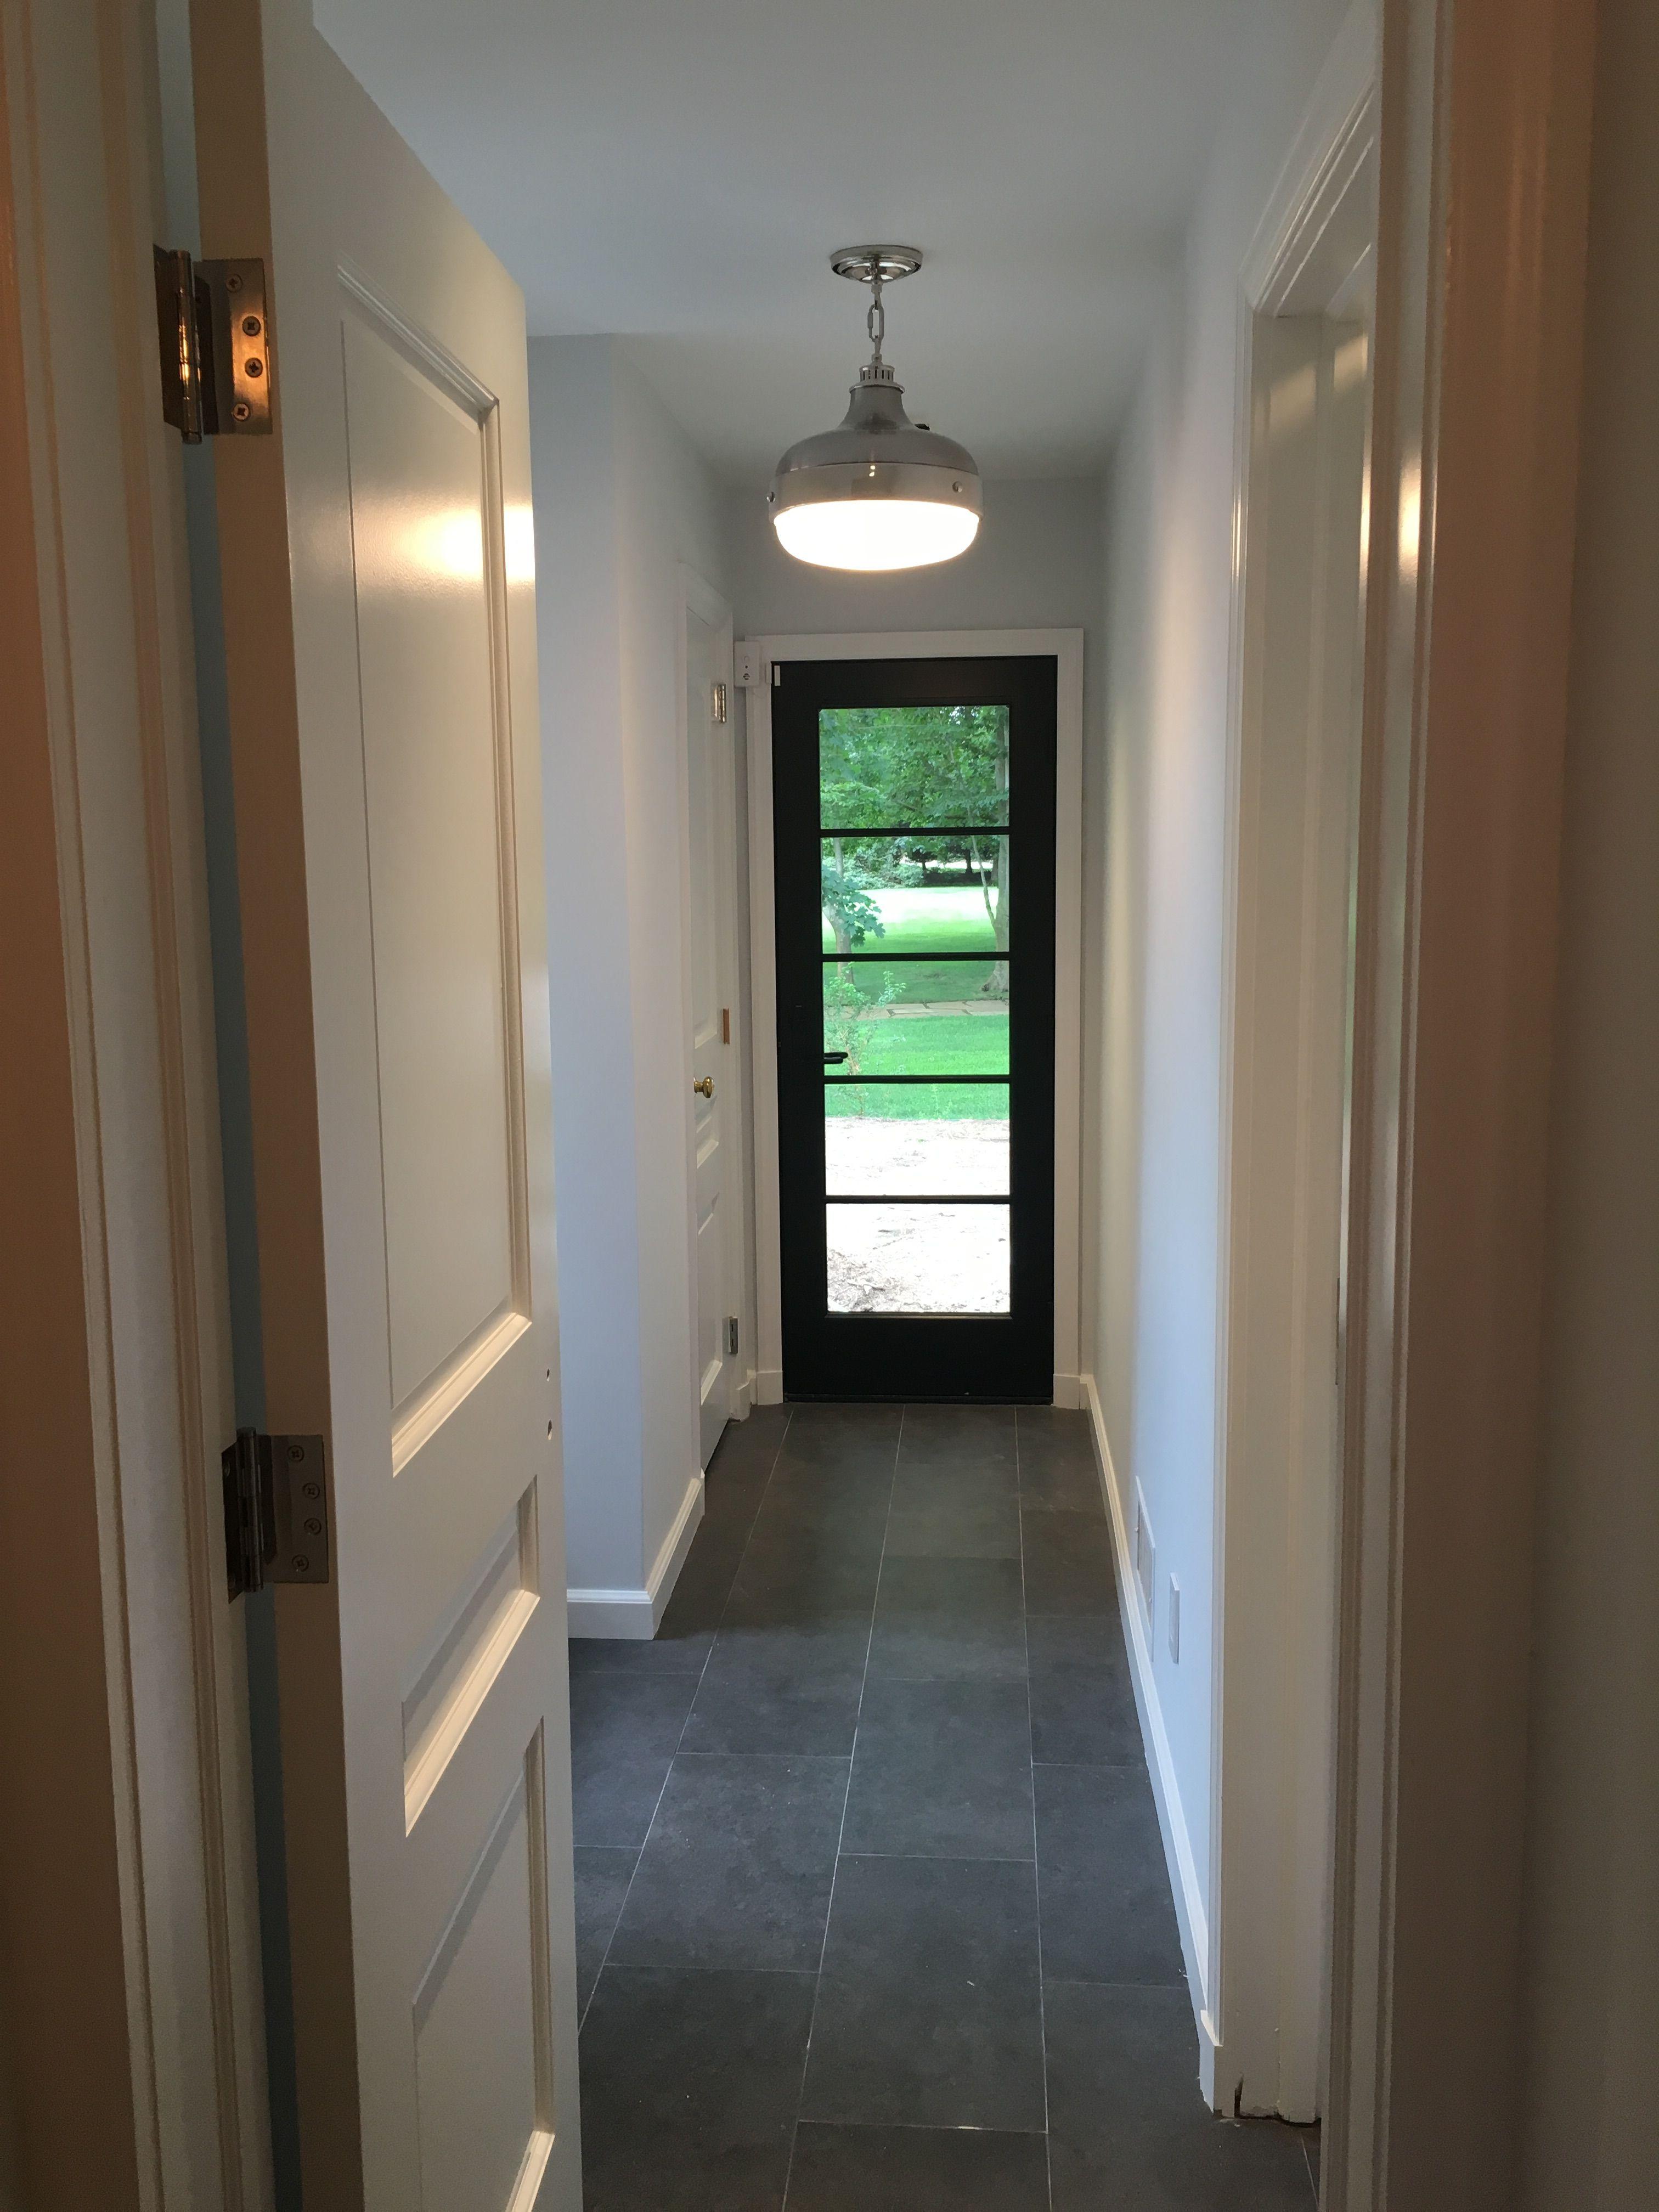 Updated Hallway And Mud Room Walls Benjamin Moore 2134 70